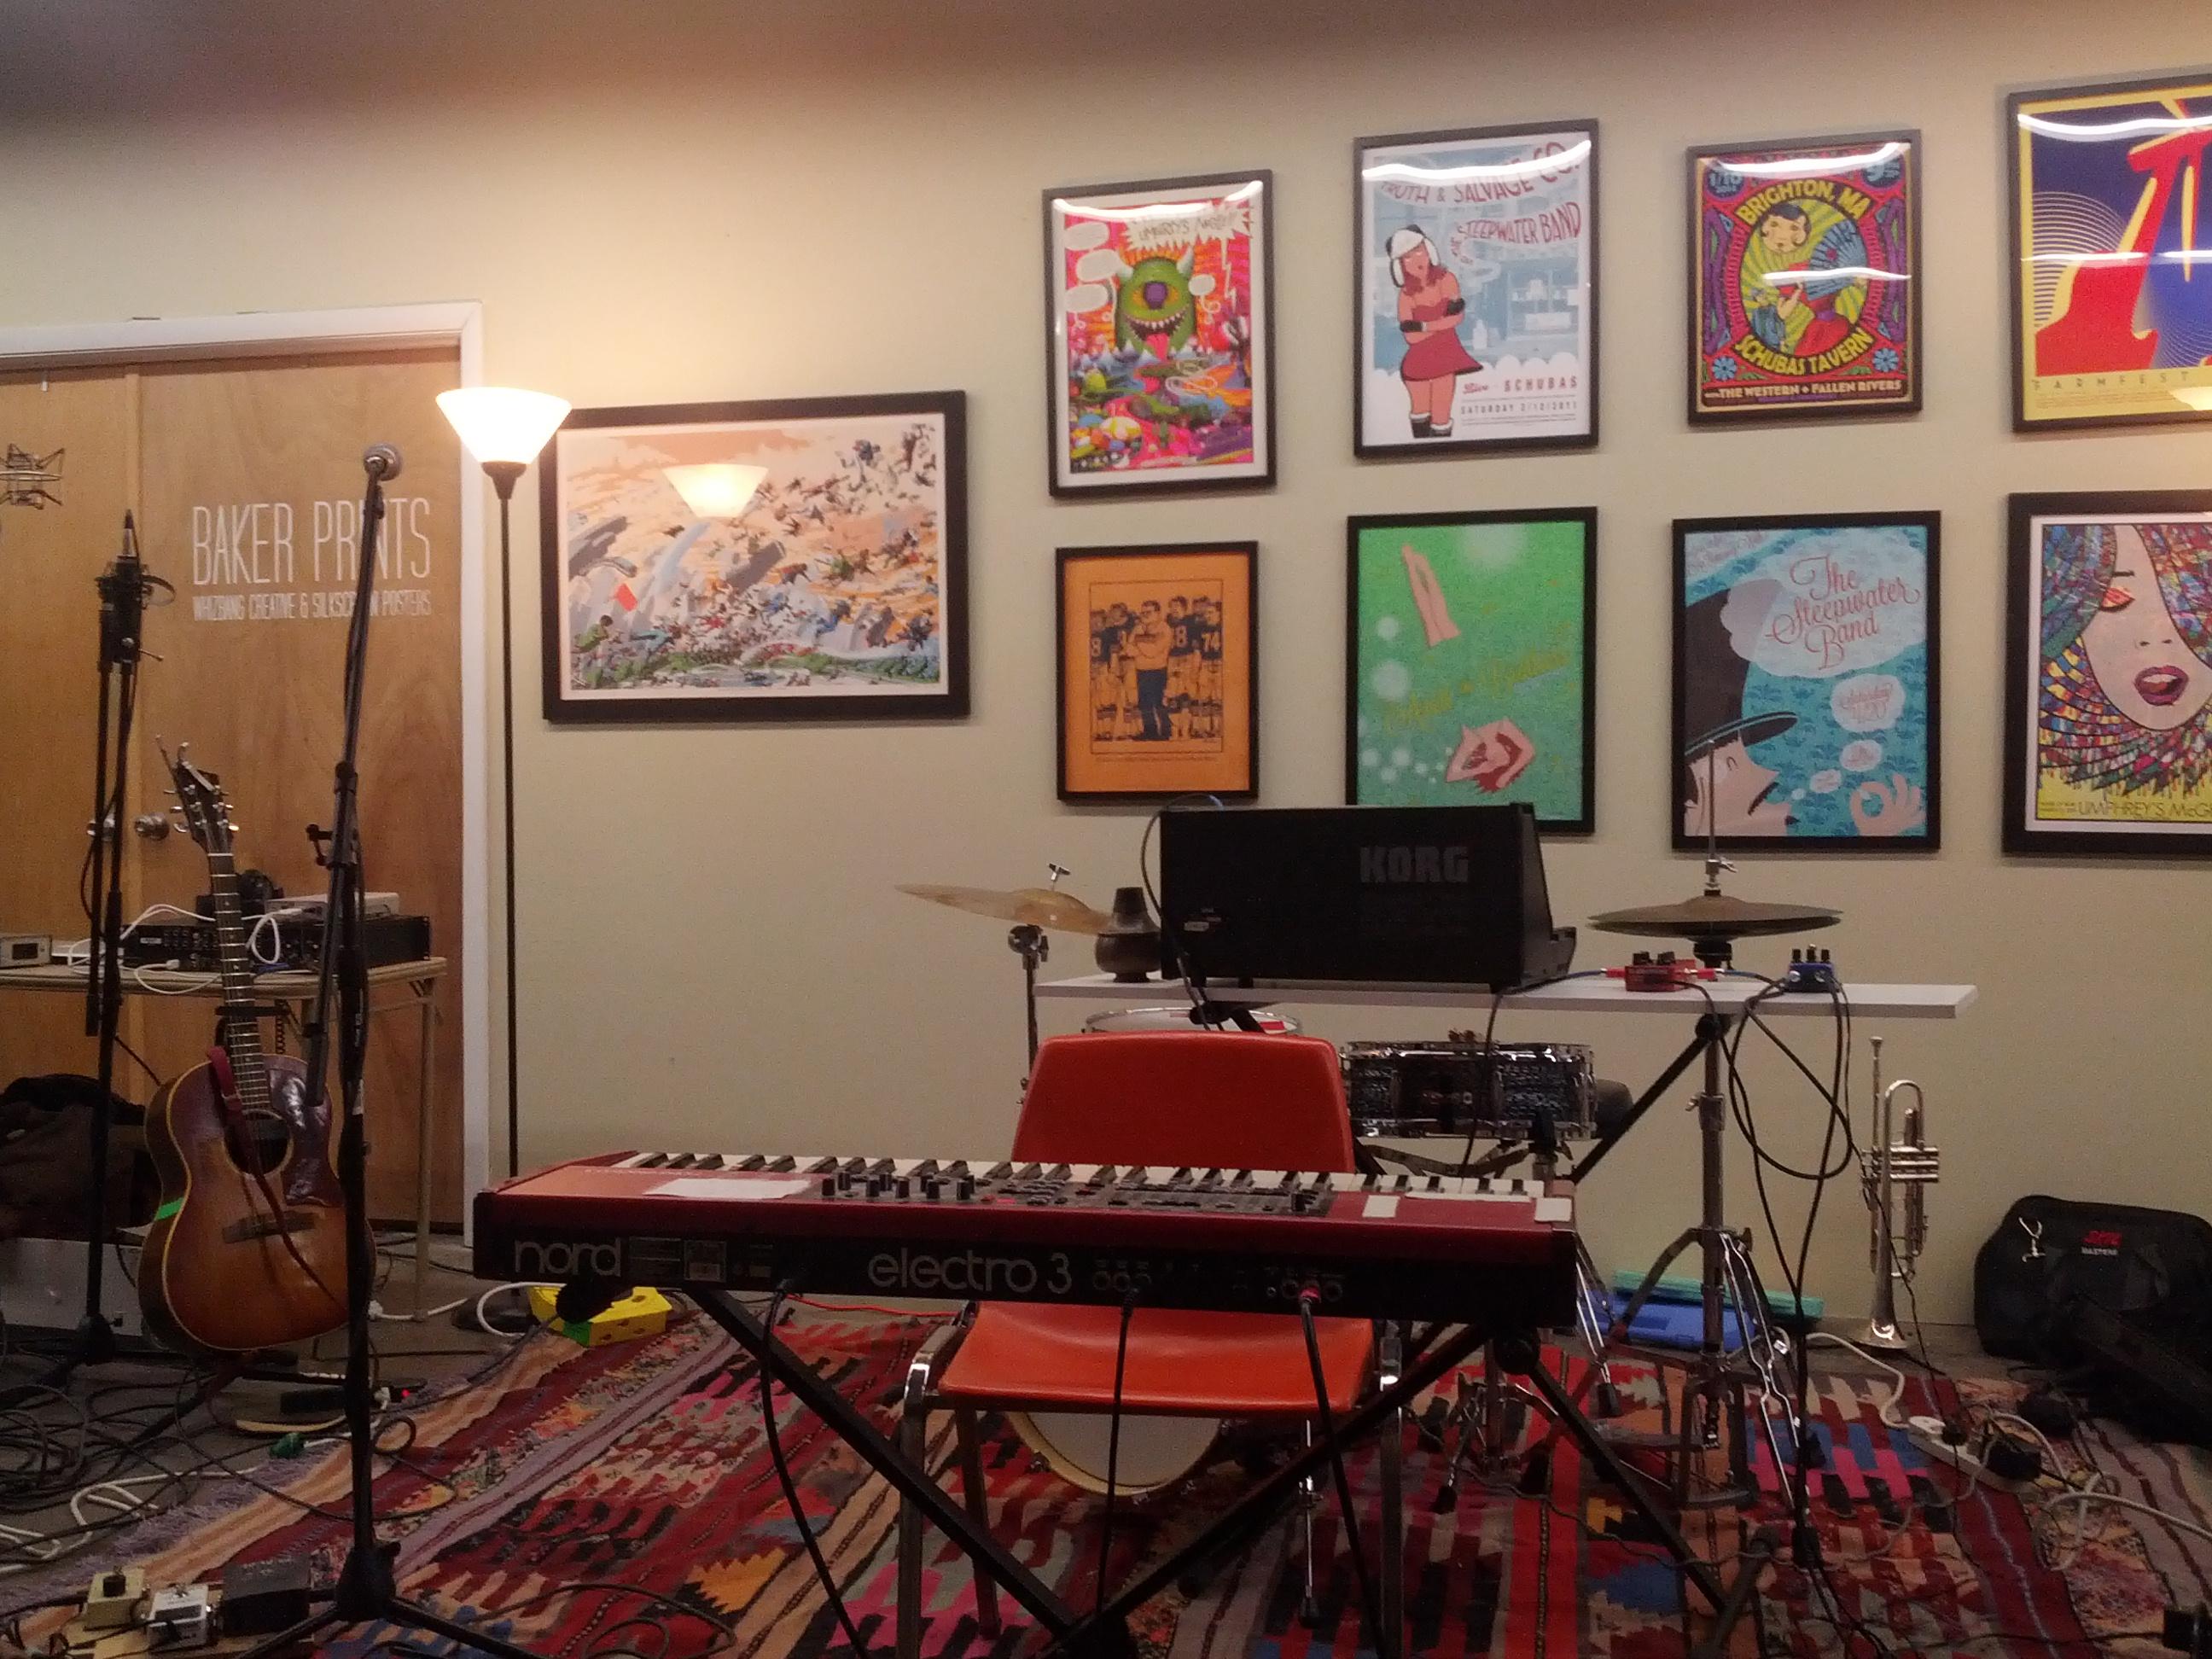 The loft pre-show